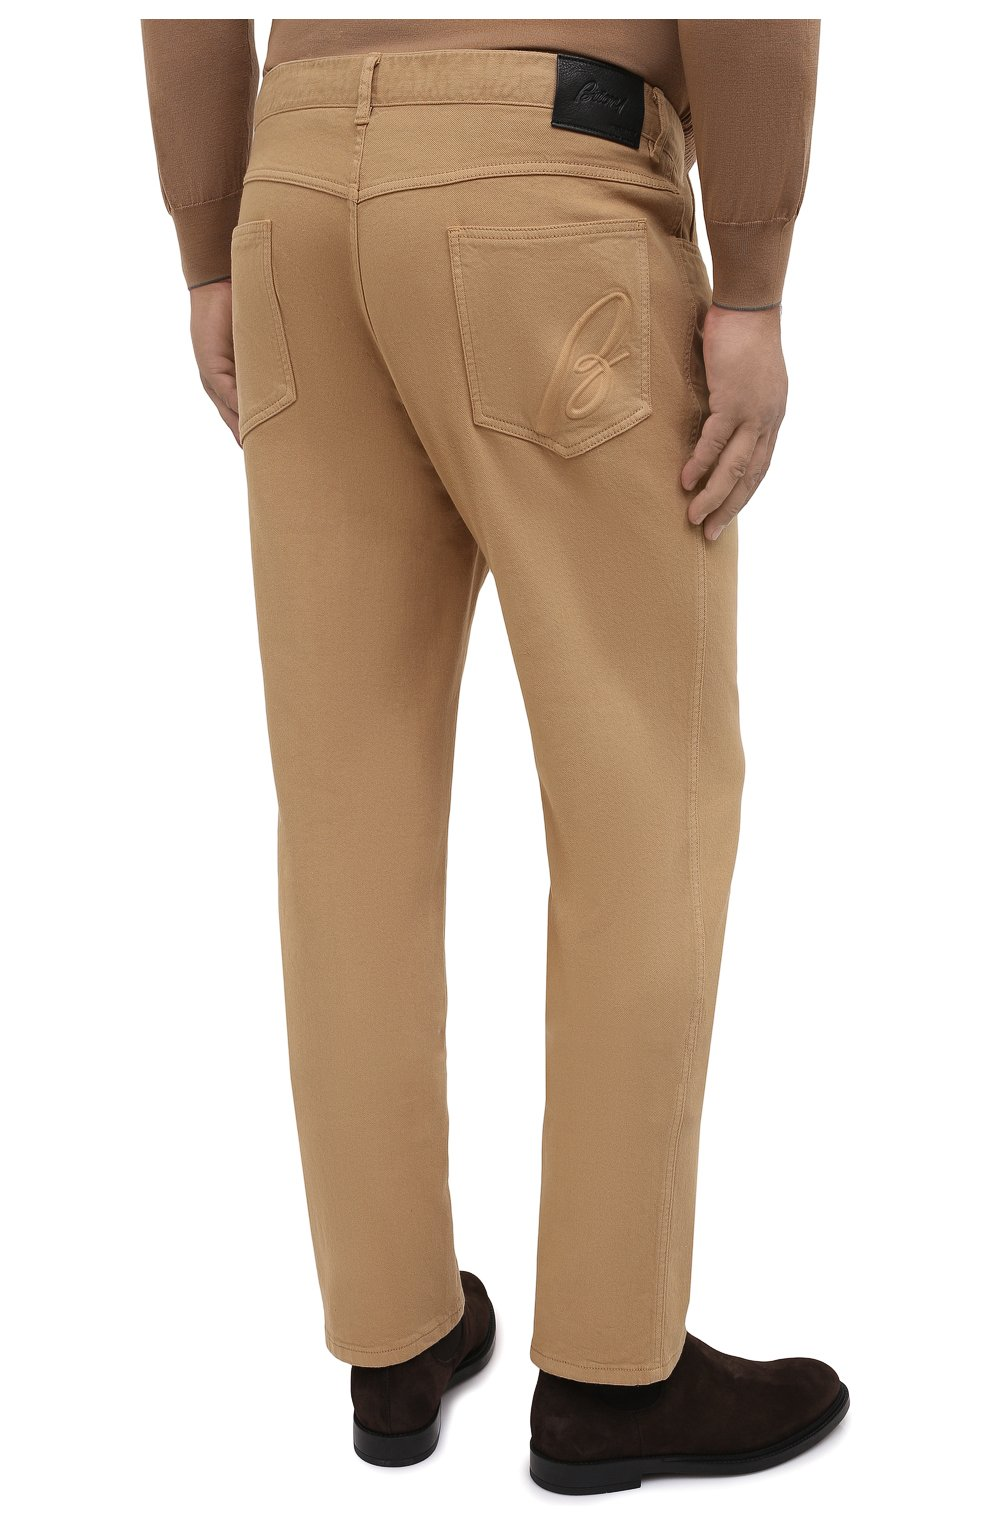 Мужские джинсы BRIONI бежевого цвета, арт. SPNJ0M/08T01/STELVI0 | Фото 4